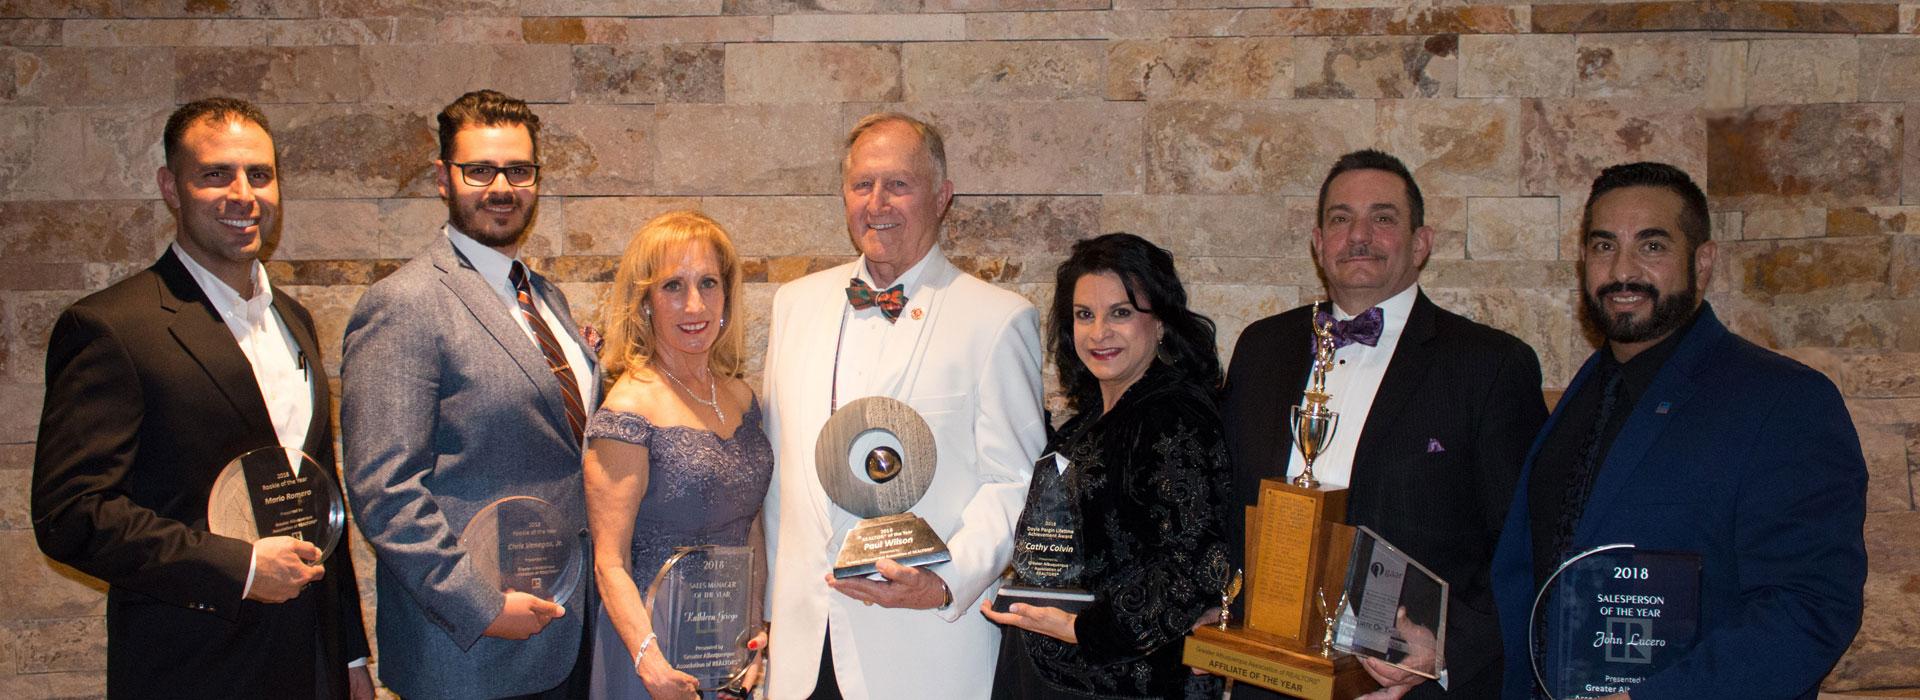 99th Annual Awards Gala